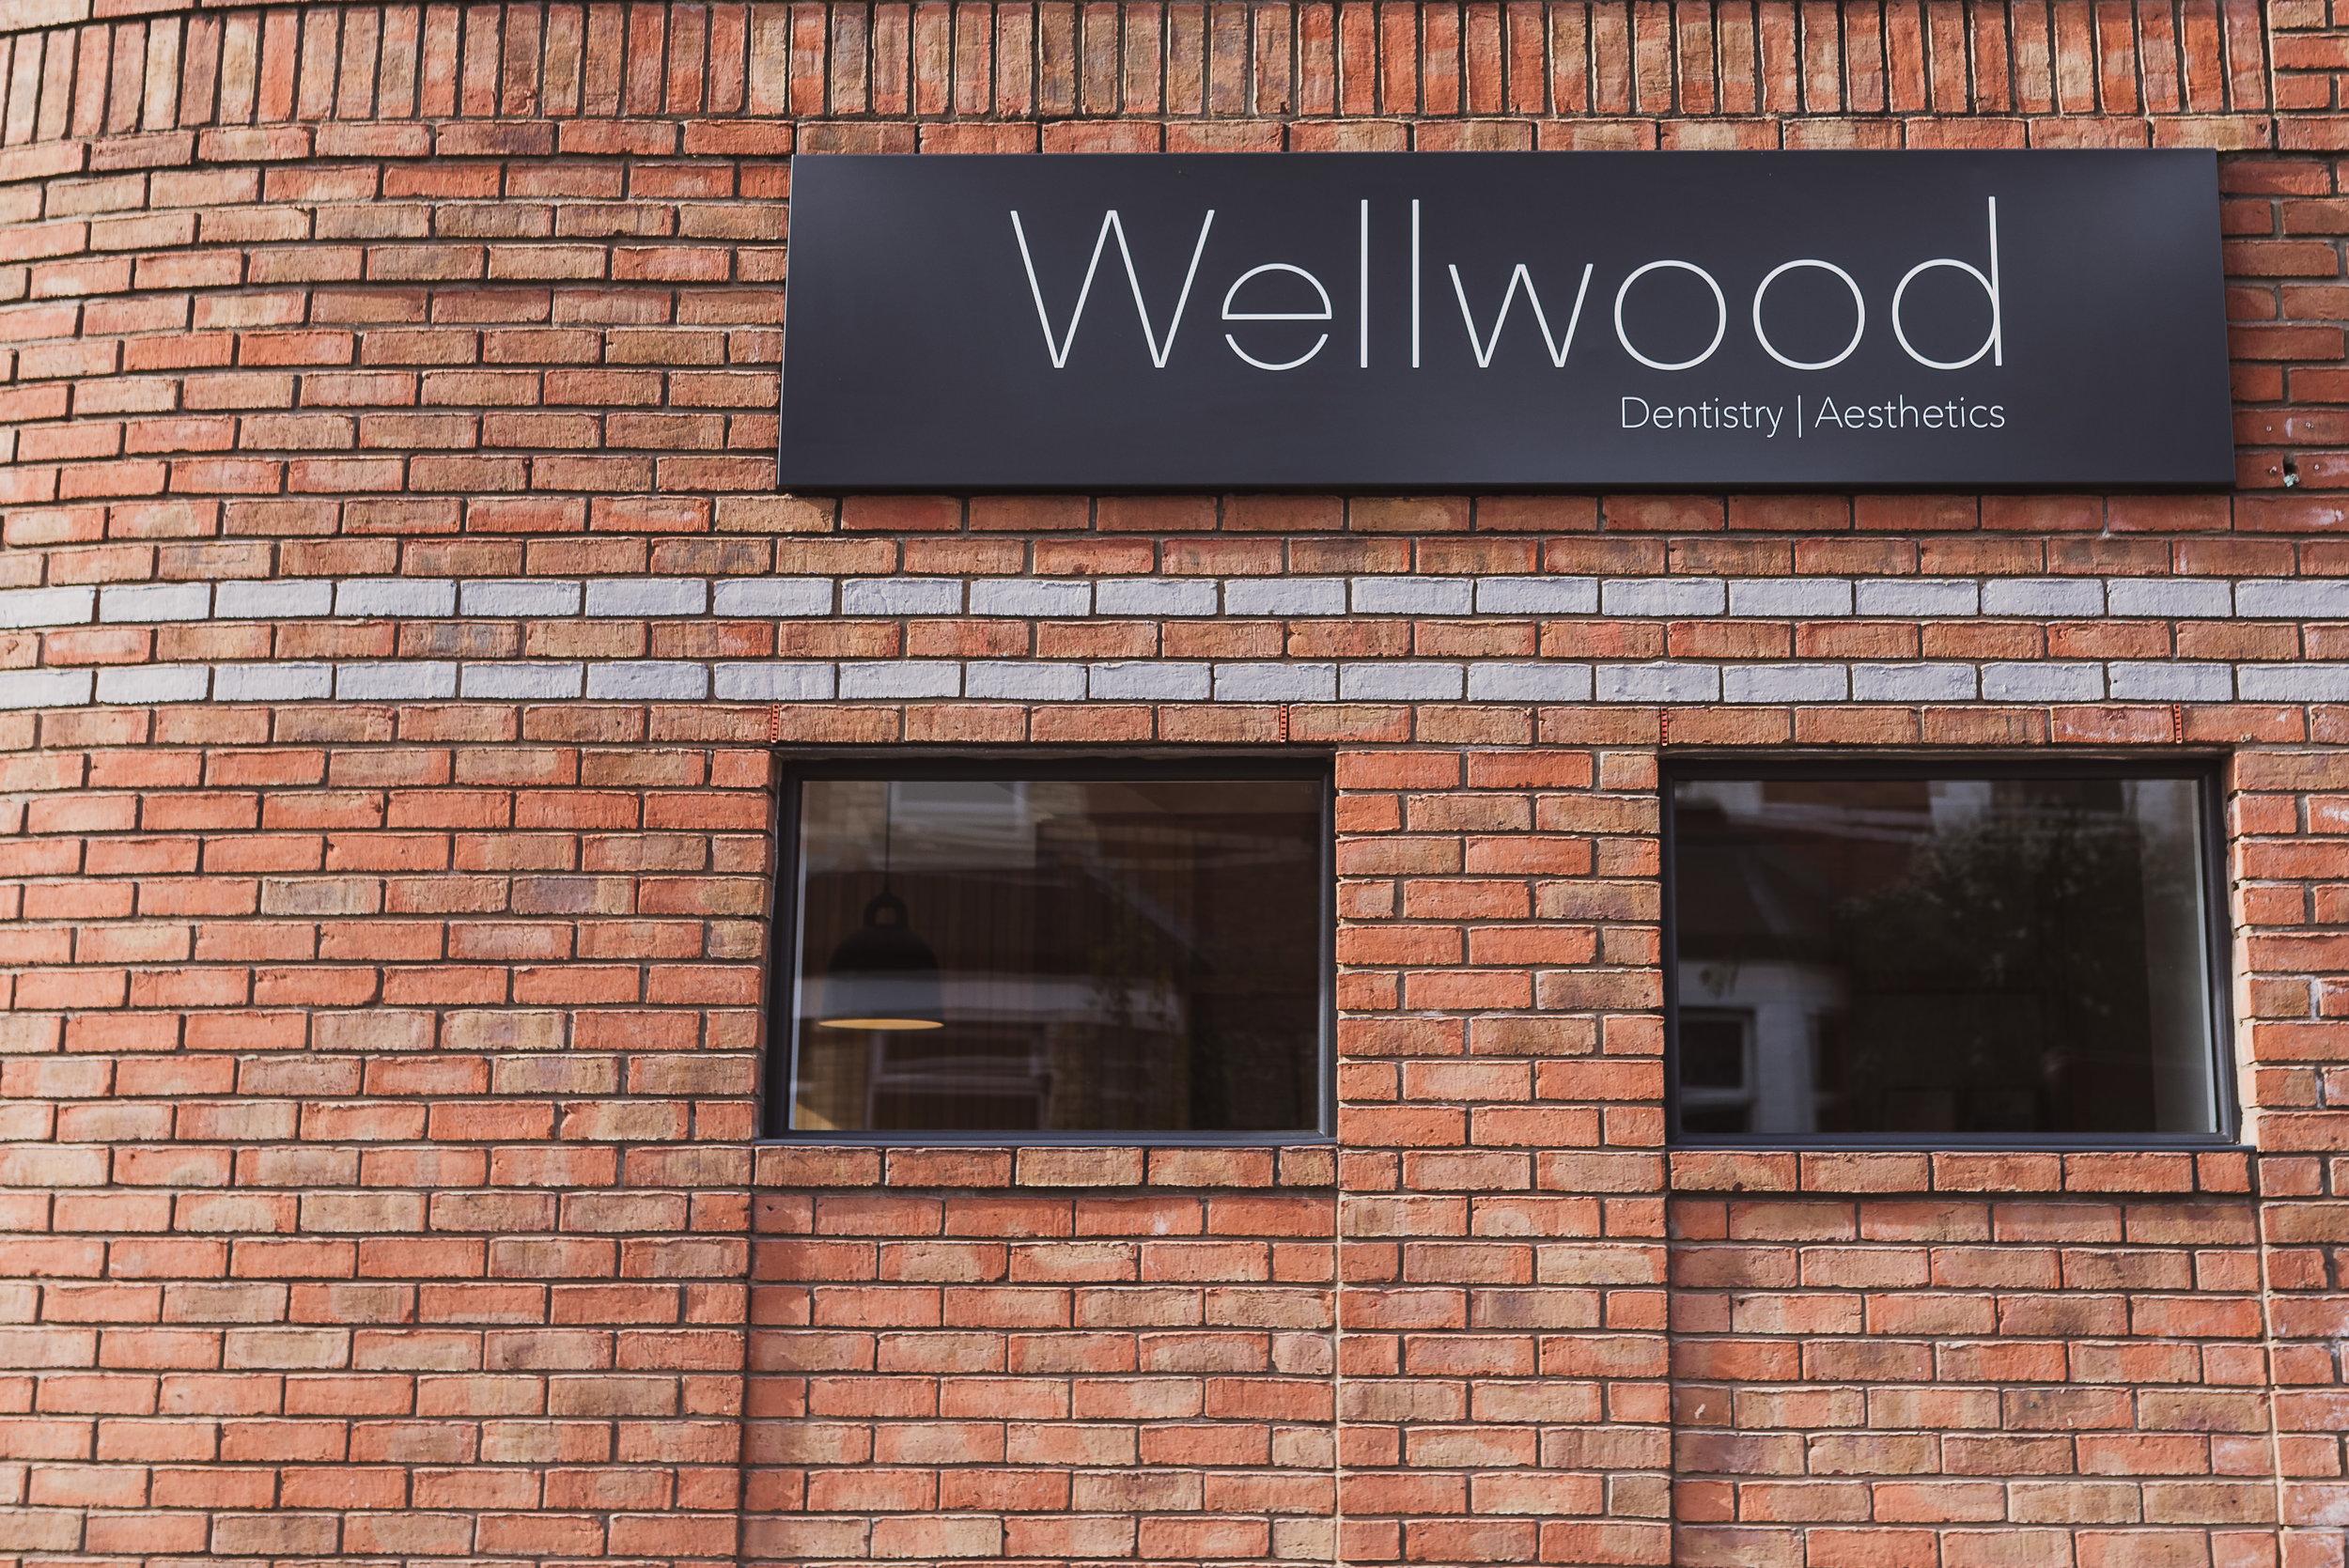 Wellwood-72.jpg